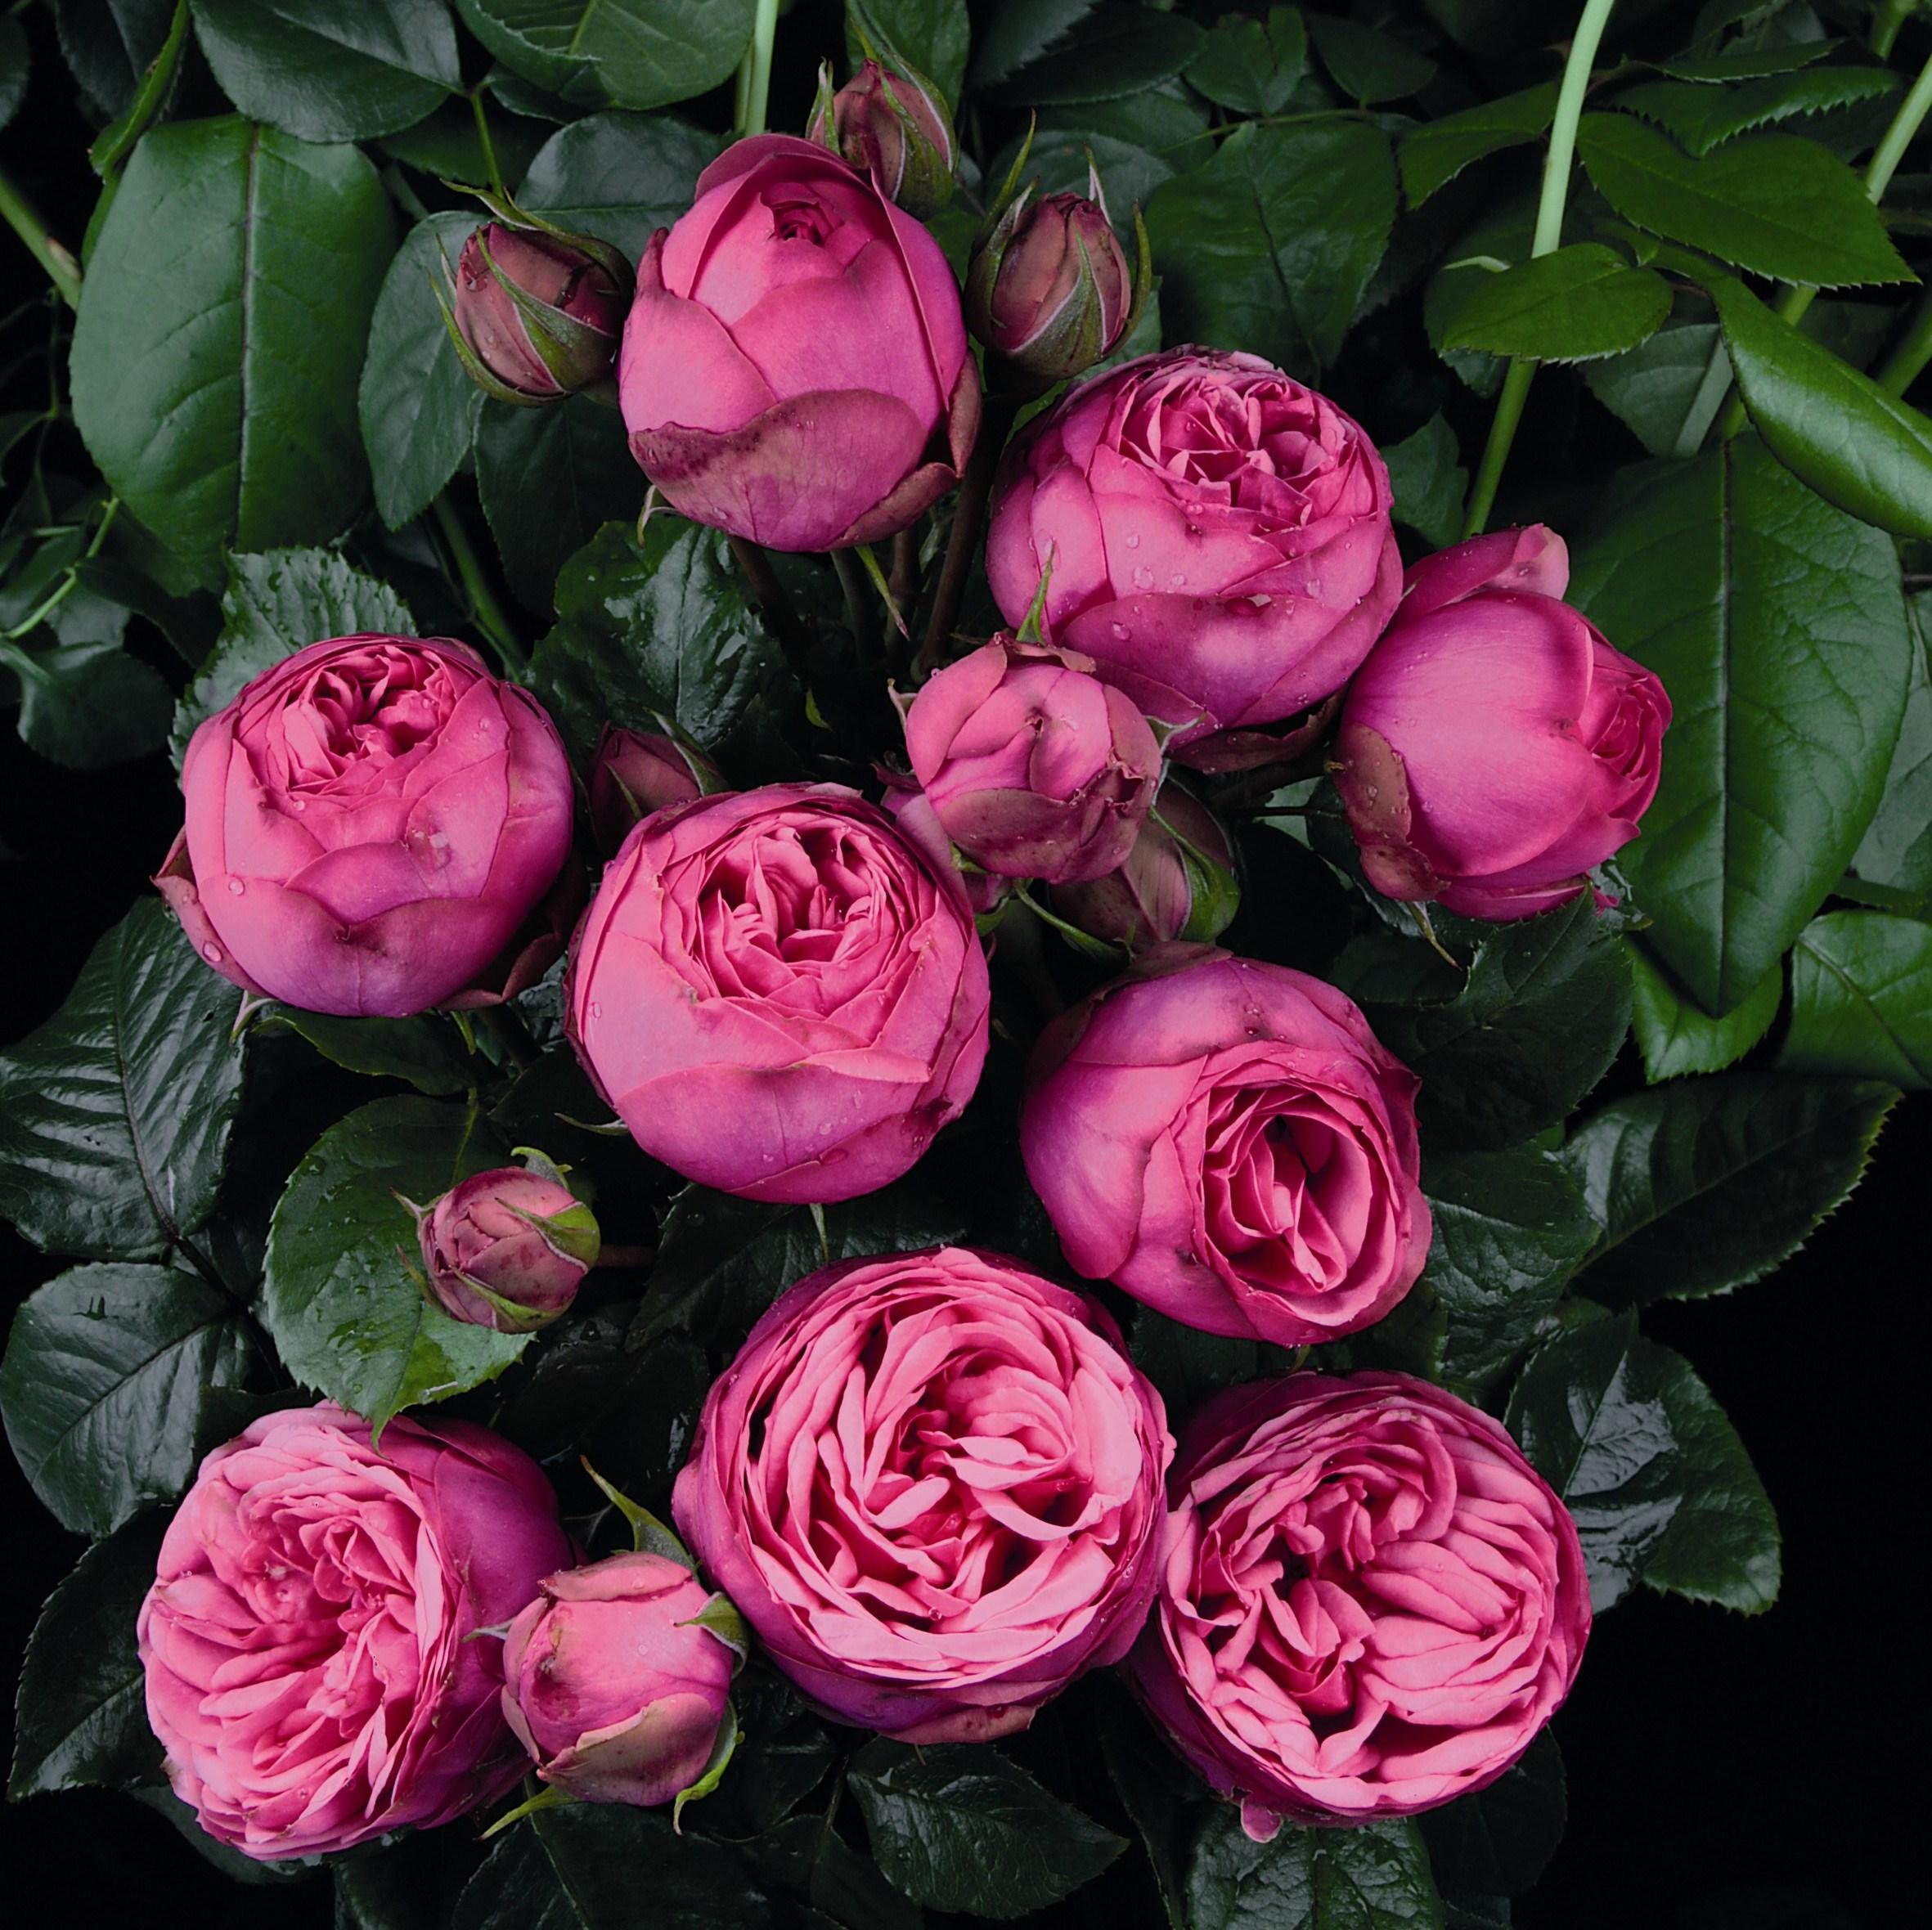 pink piano nostalgie rosen online kaufen rosen tantau. Black Bedroom Furniture Sets. Home Design Ideas